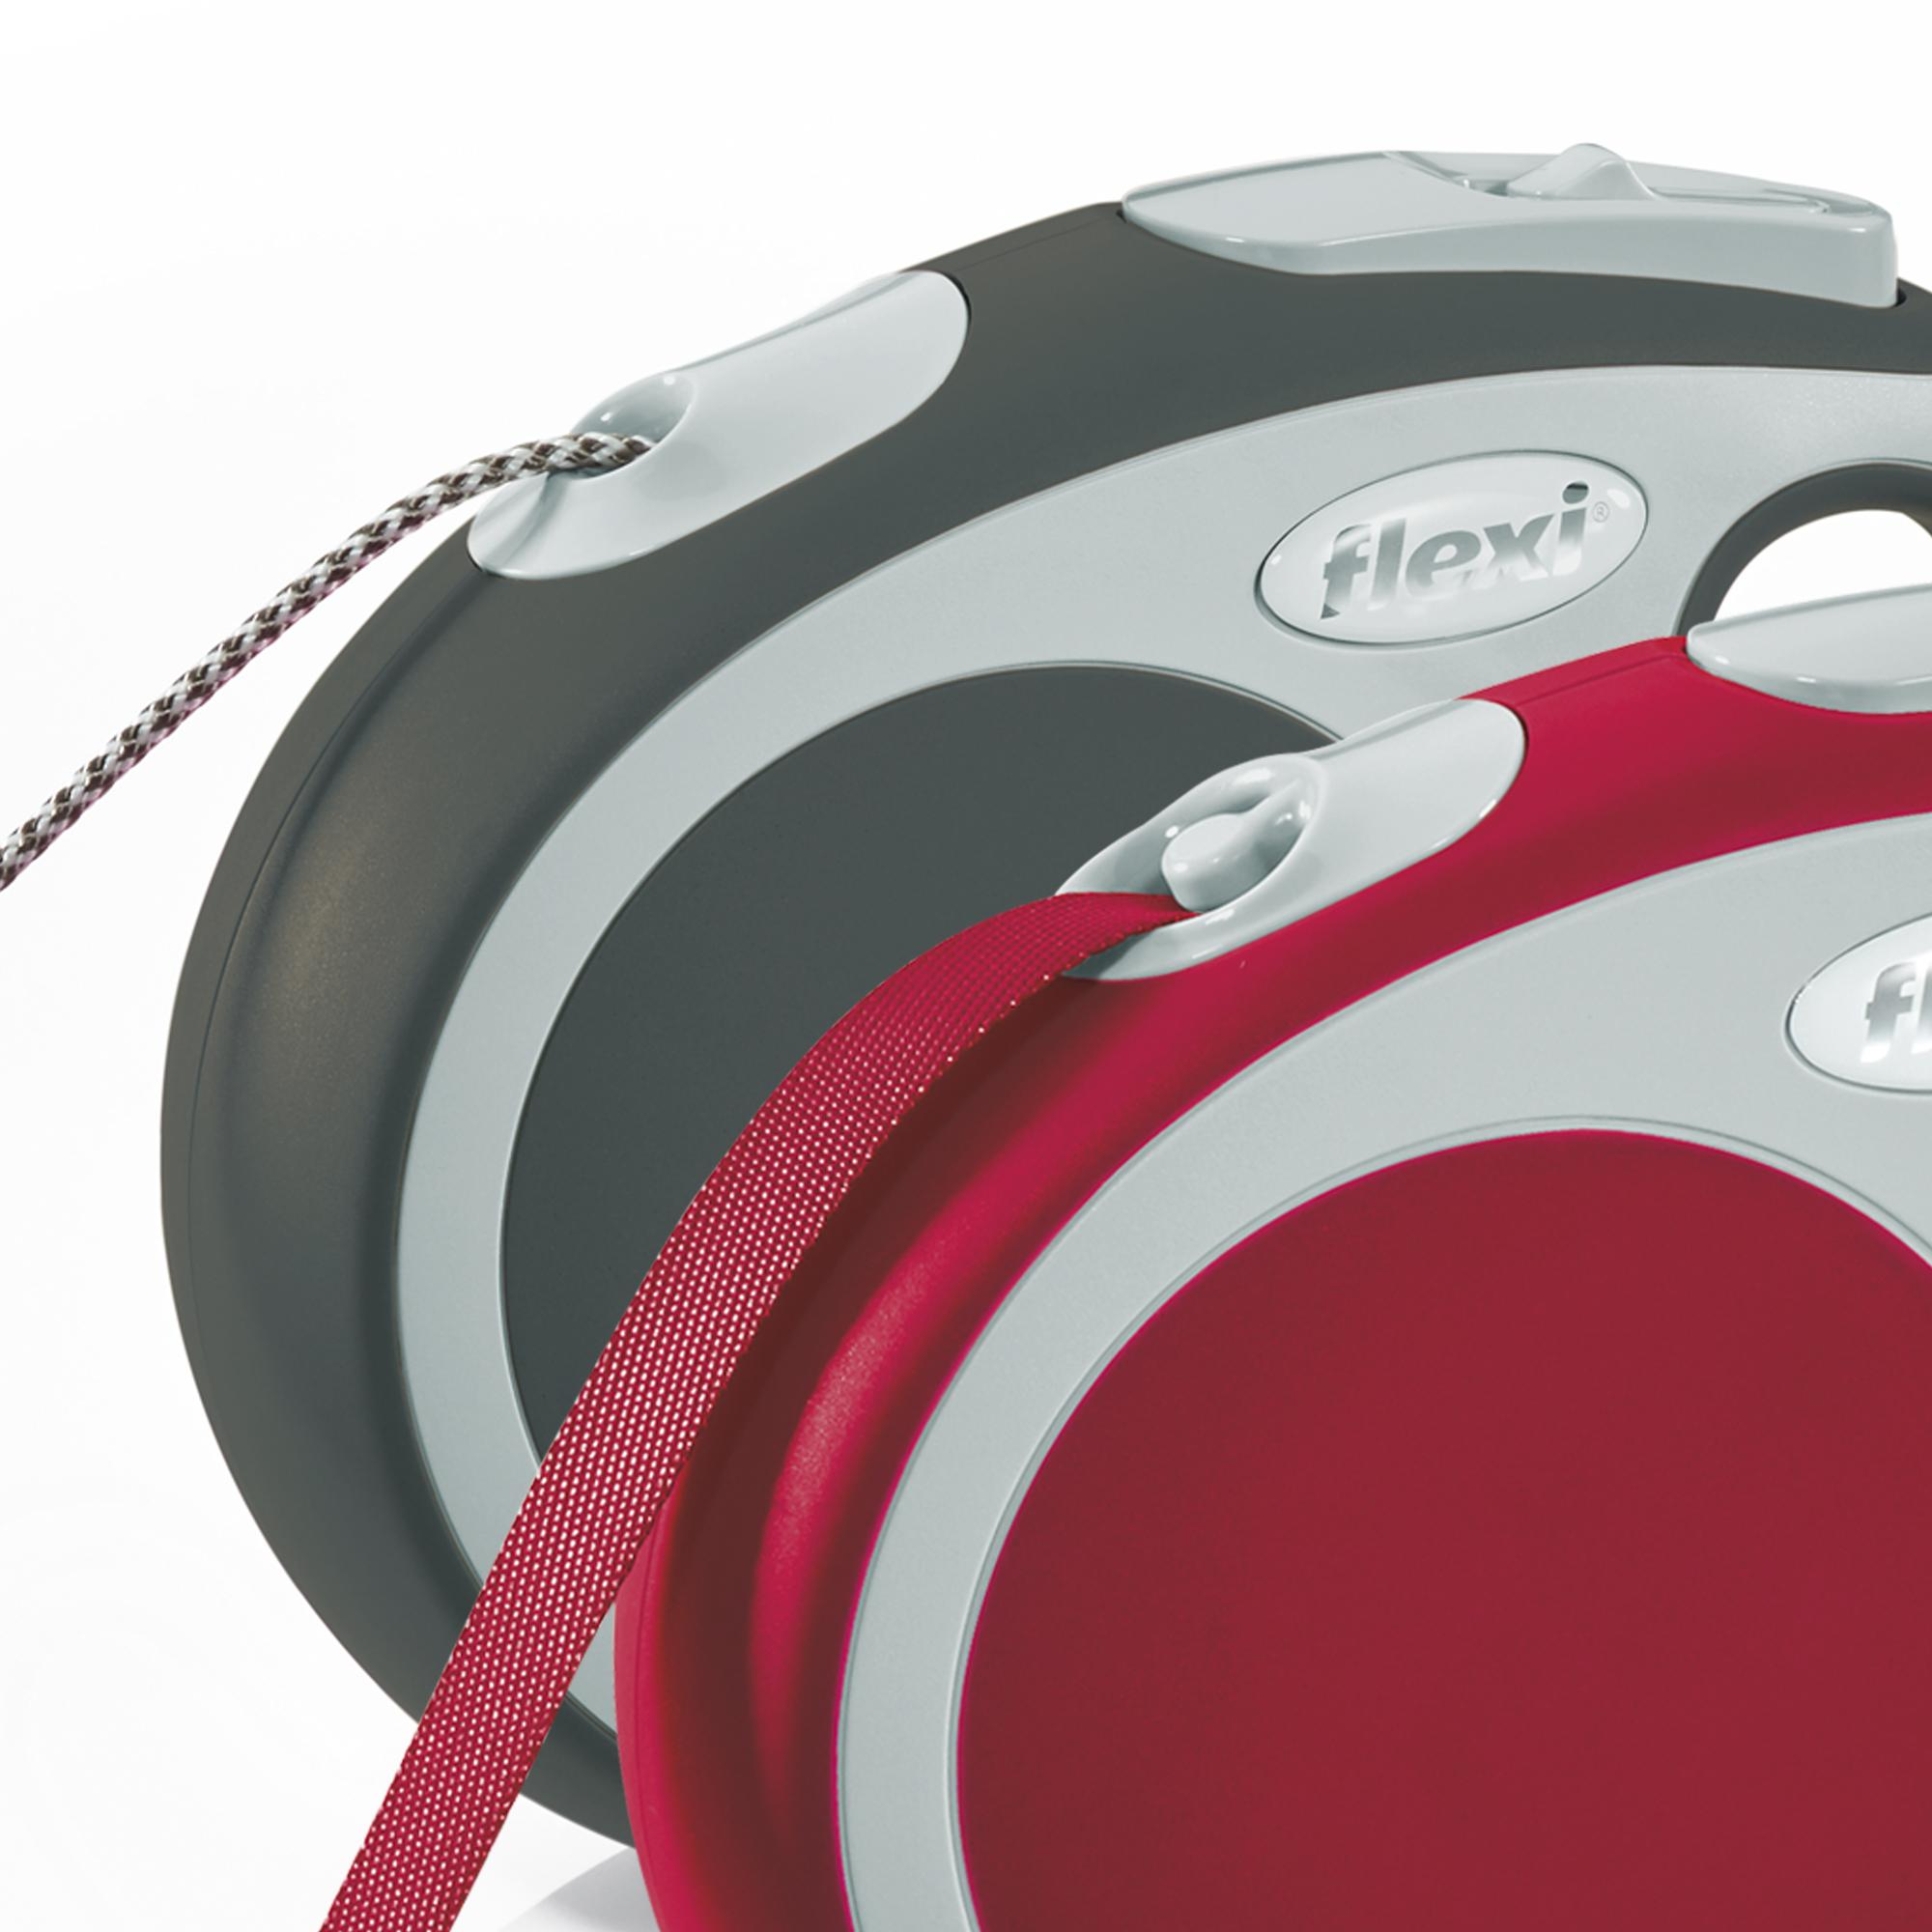 Amazon.com : Flexi Vario Retractable Dog Leash (Tape), 16